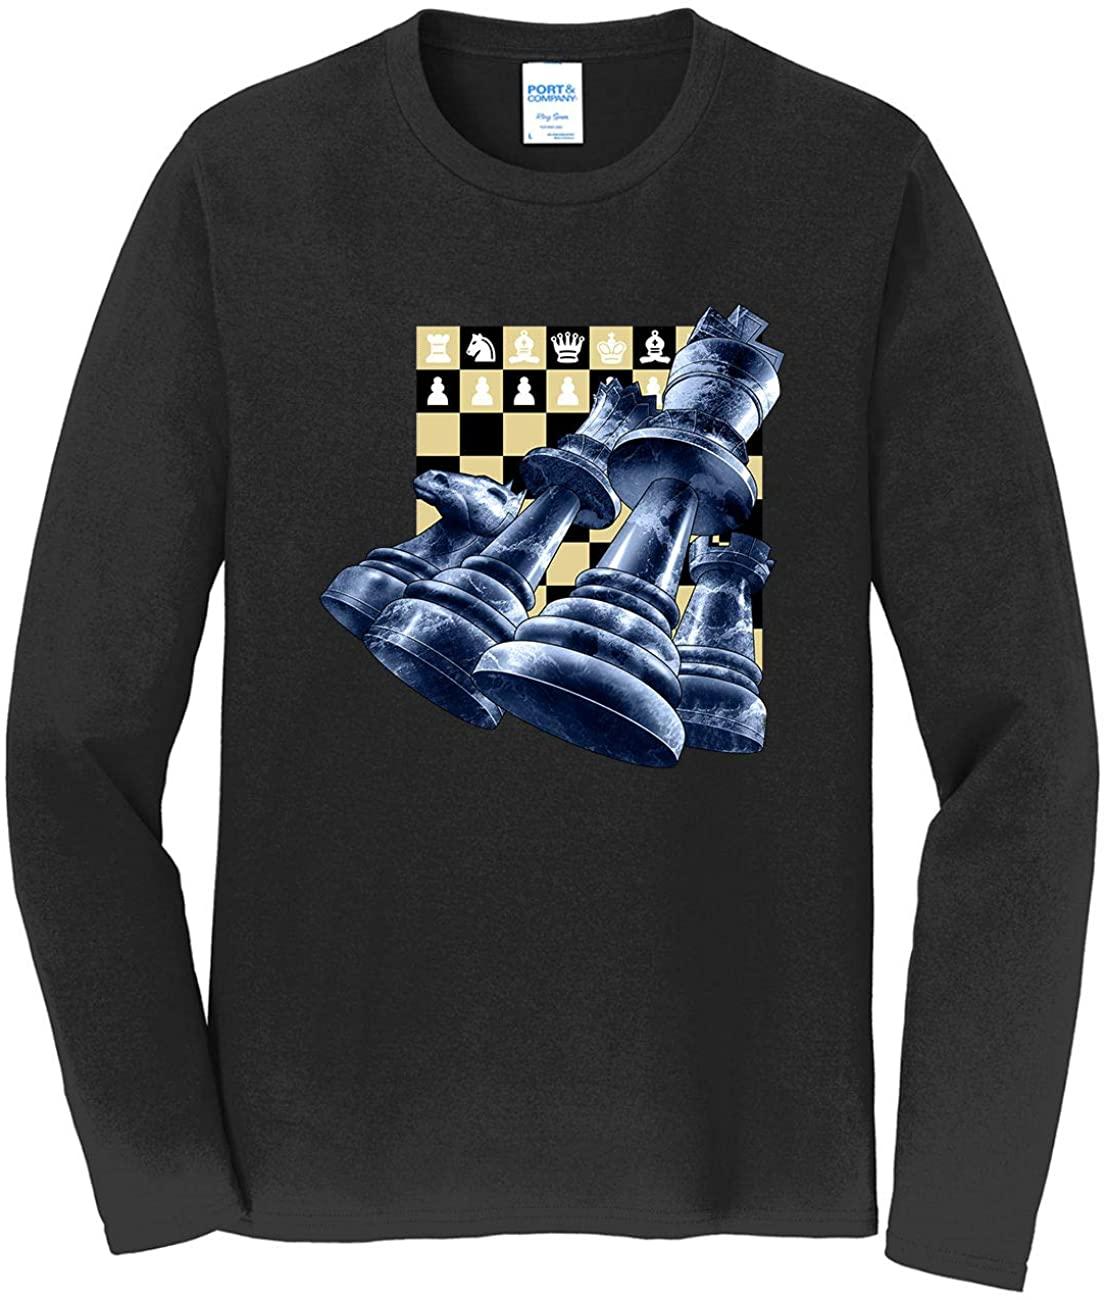 HARD EDGE DESIGN Men's Chess Pieces Long Sleeve T-Shirt, 2X-Large, Black